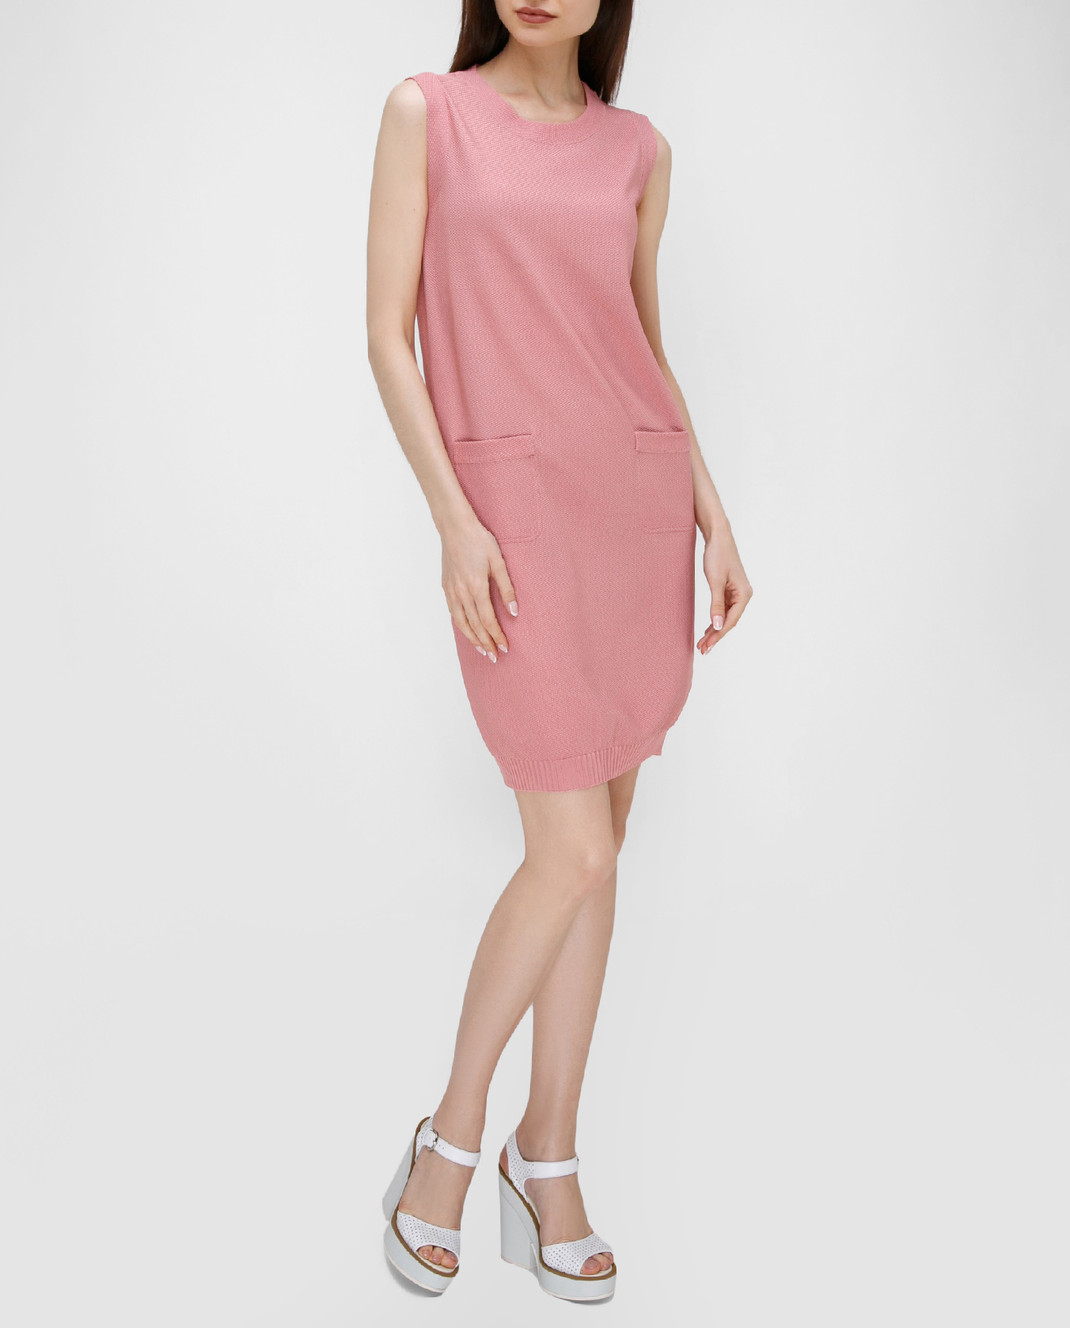 Antonella Creazioni Розовое платье 12260 изображение 2